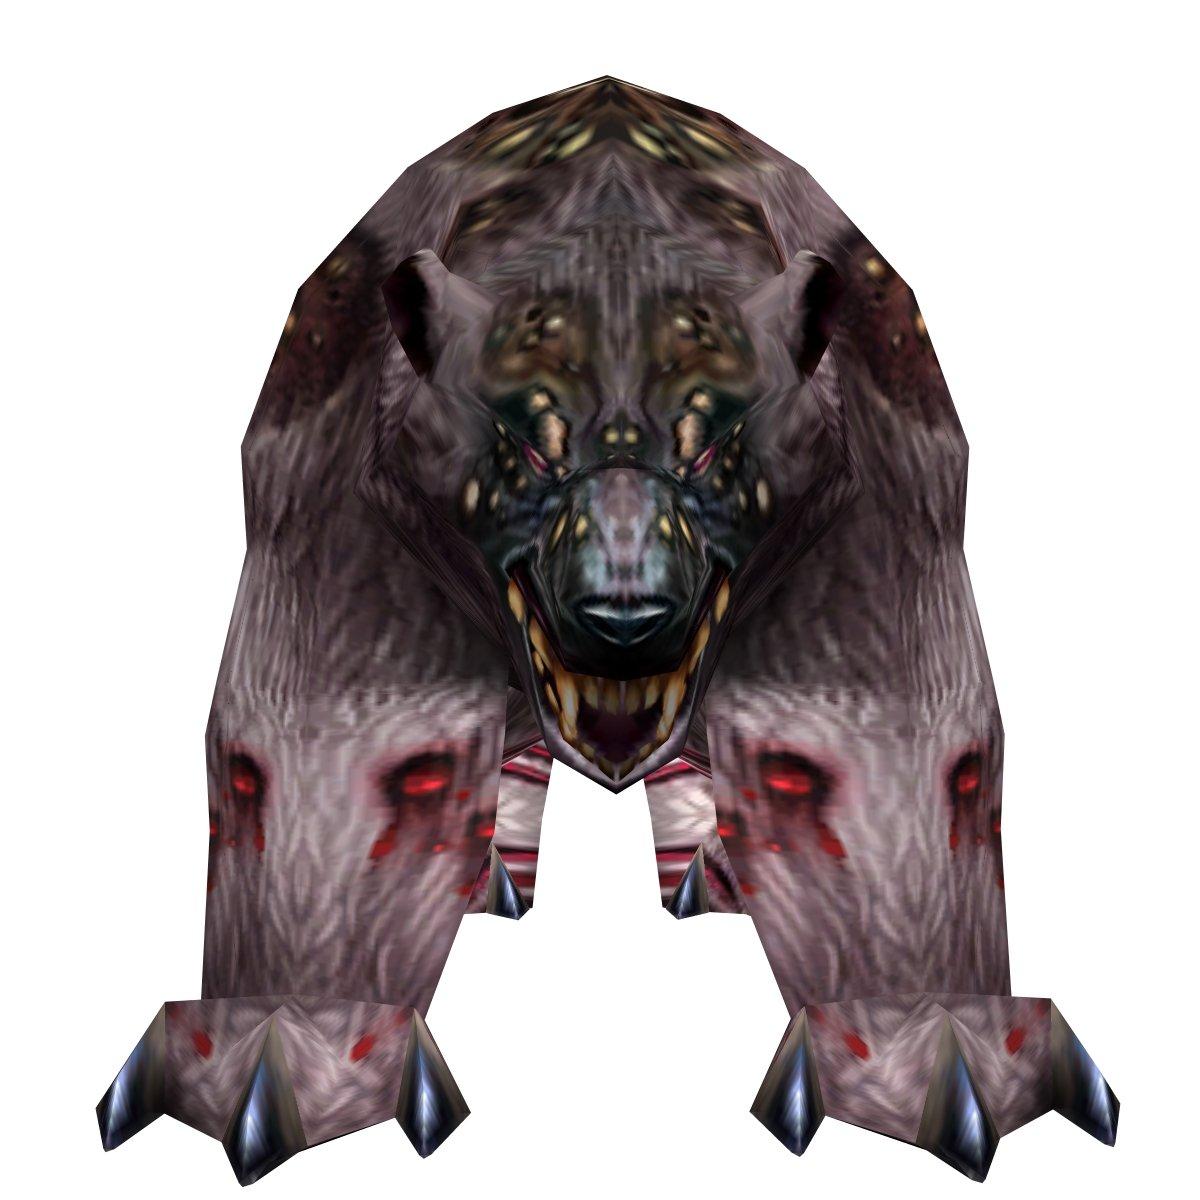 Image of: Pig Lowpoly Game Animal Bear8 Leho1 3d Model Pinterest Lowpoly Game Animal Bear8 Leho1 3d Model In Bear 3dexport